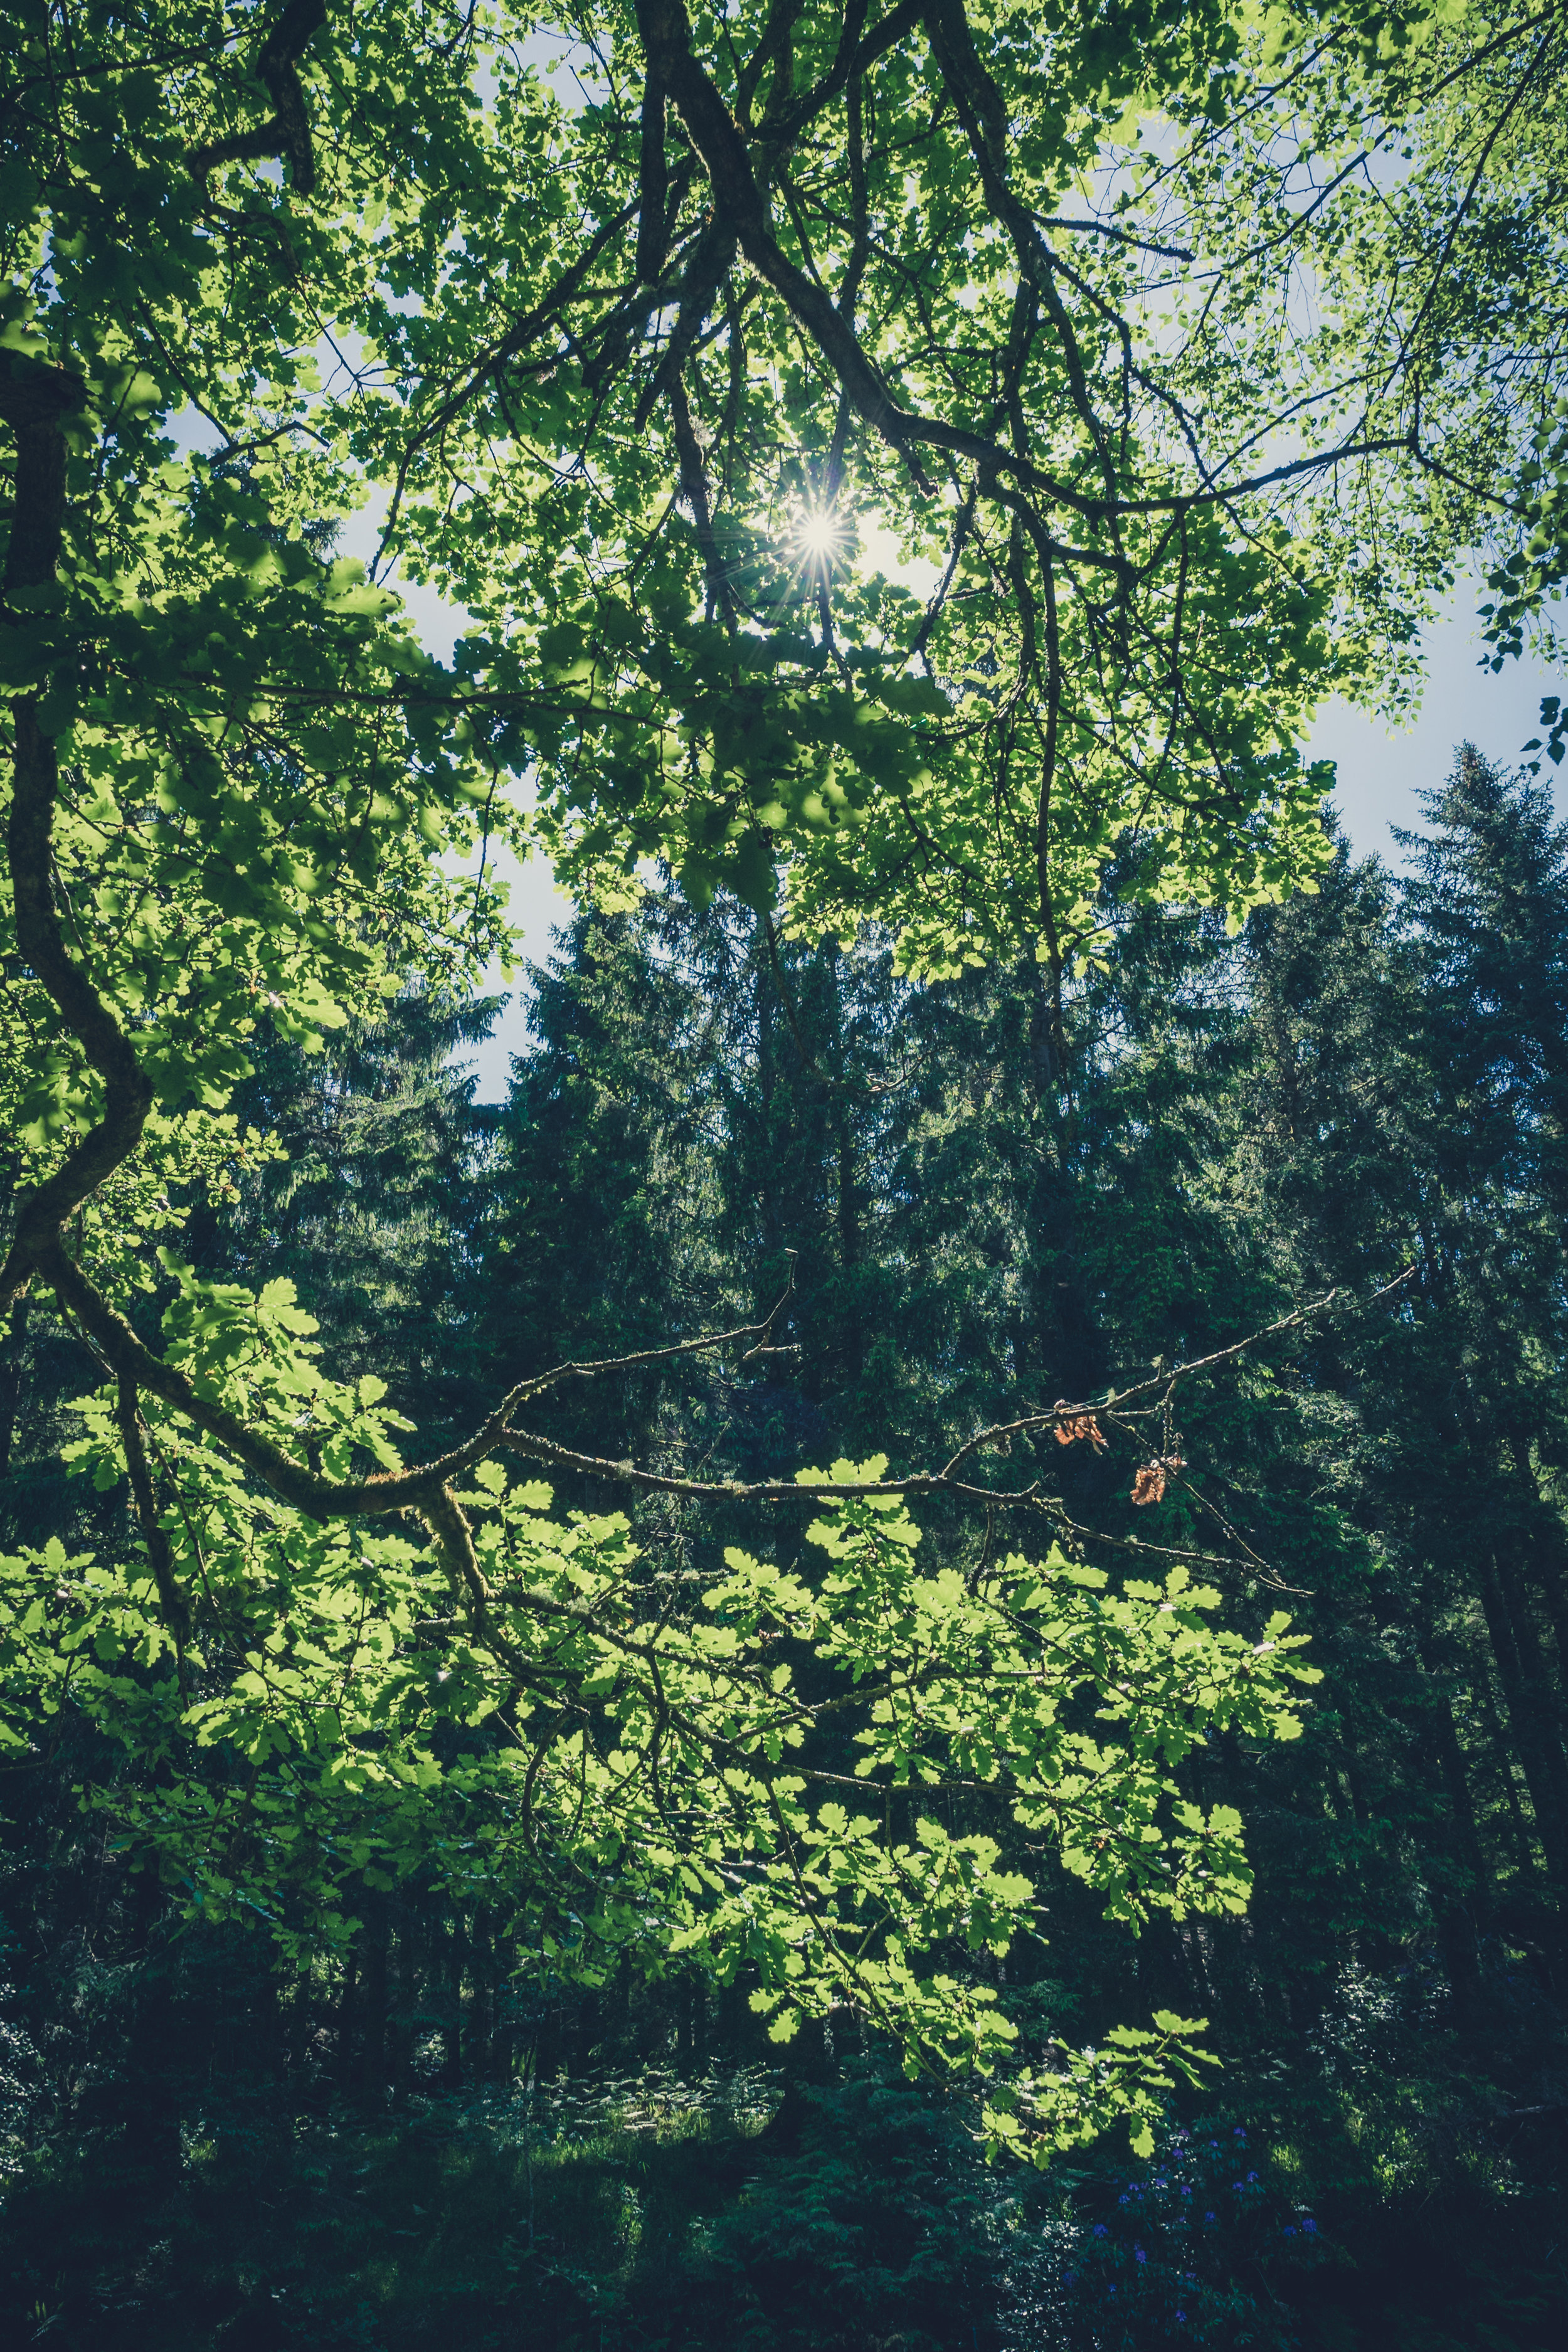 Vale of Clara. Walking in Wicklow. The garden of Ireland. Wicklow. Clara Vale. Ferns. Ireland. trees. photography. sunlight.jpg